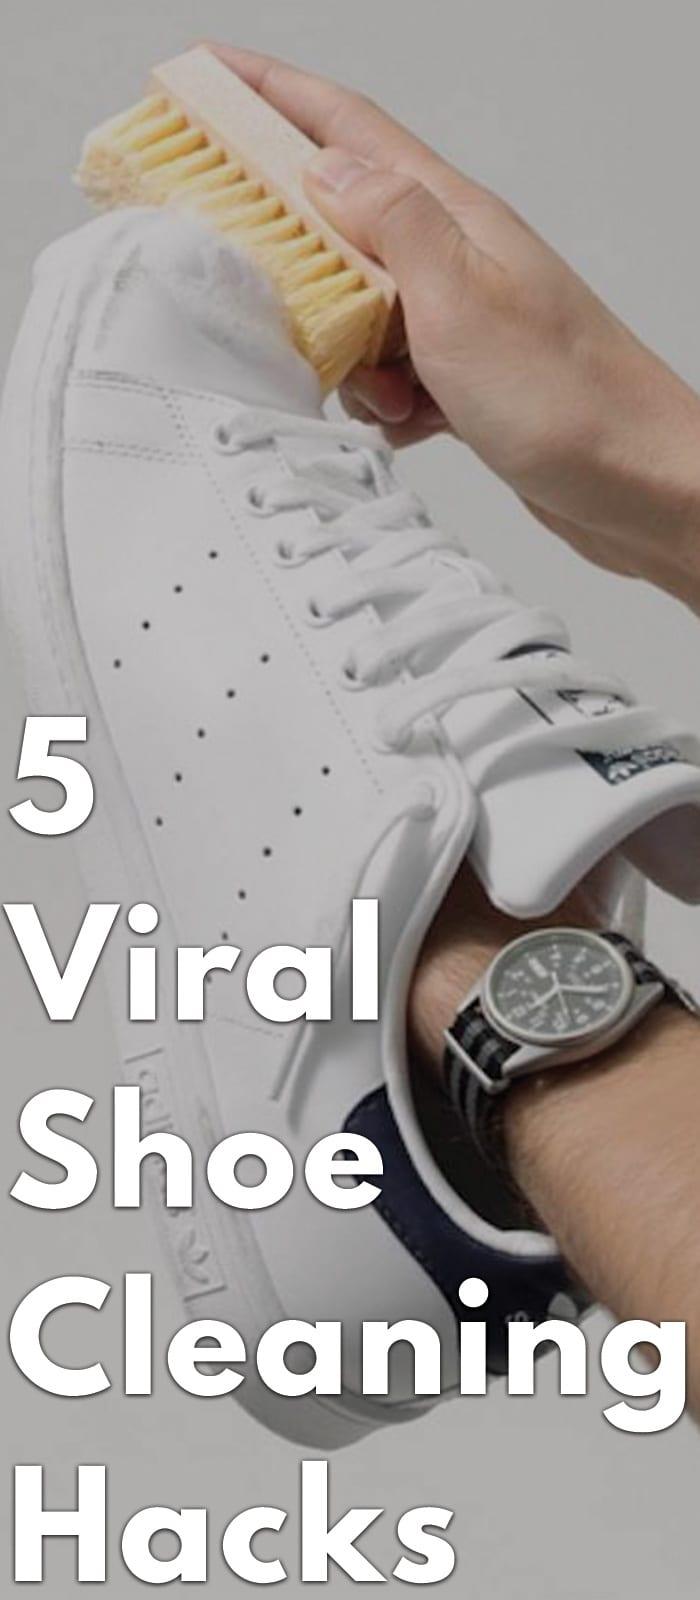 5 Viral Shoe Cleaning Hacks